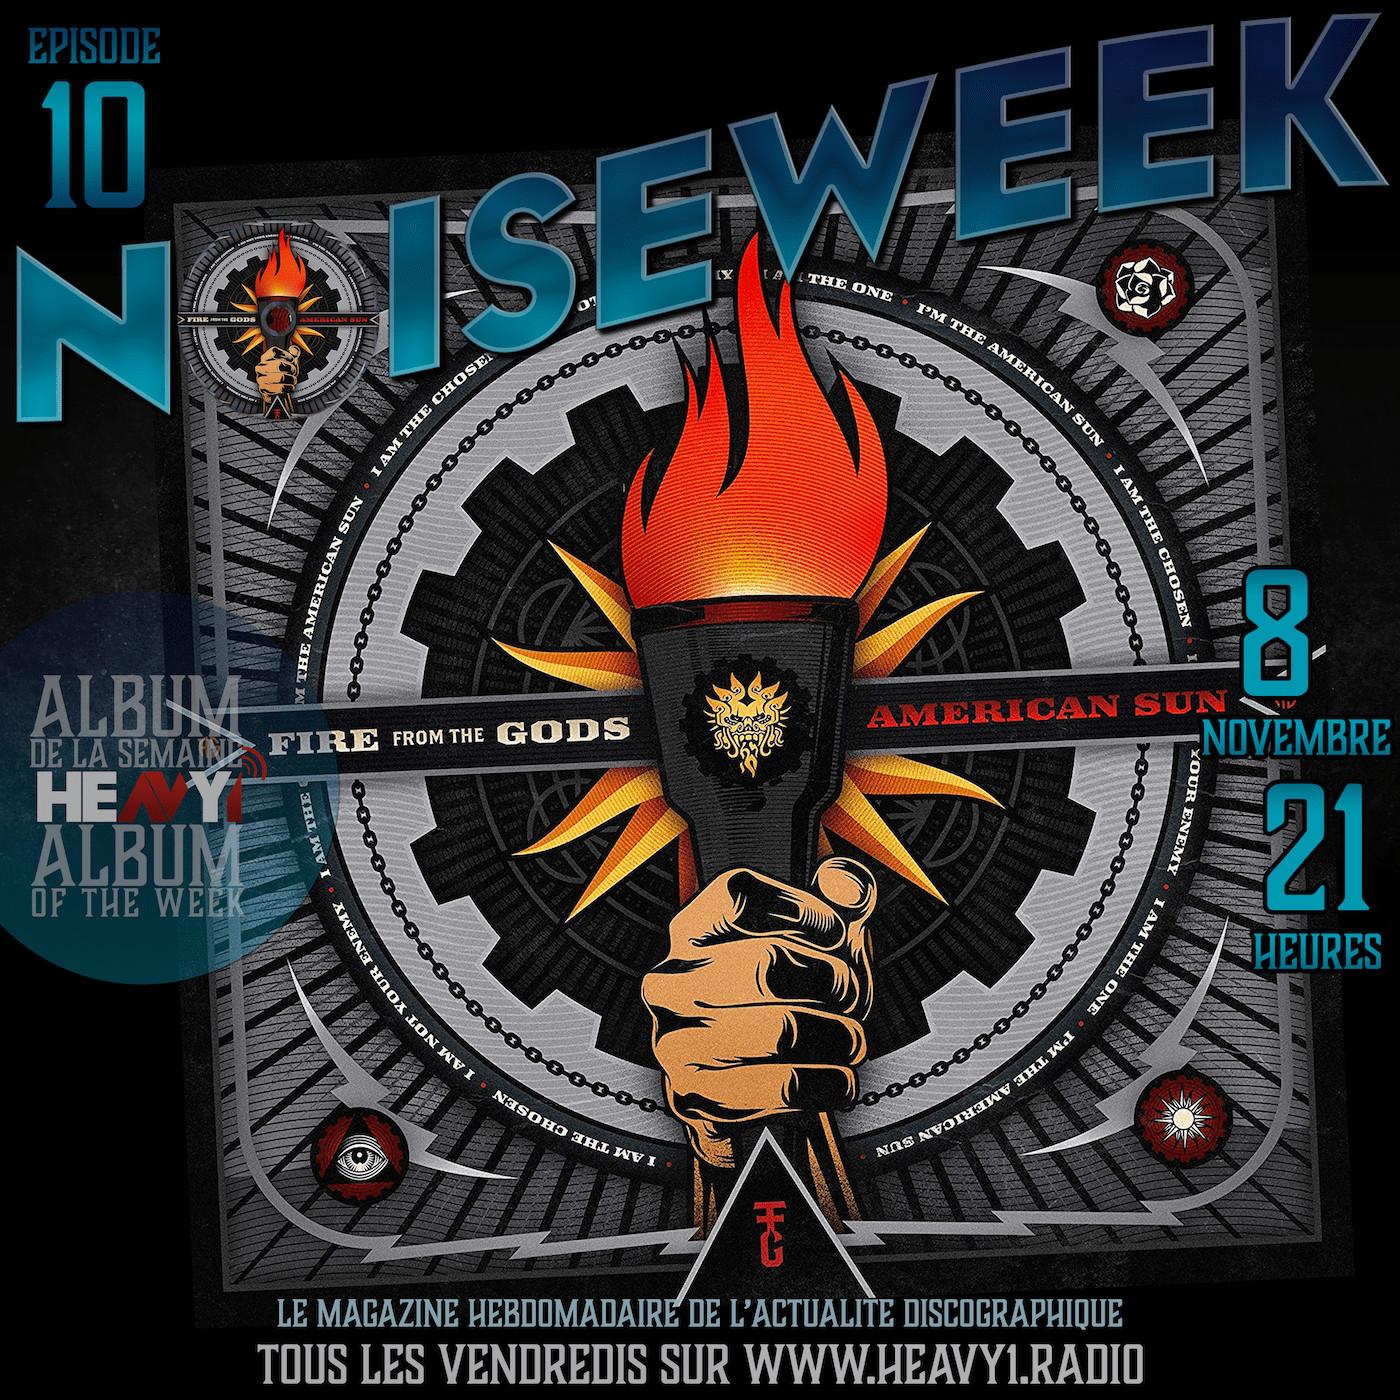 Noiseweek #10 Saison 3